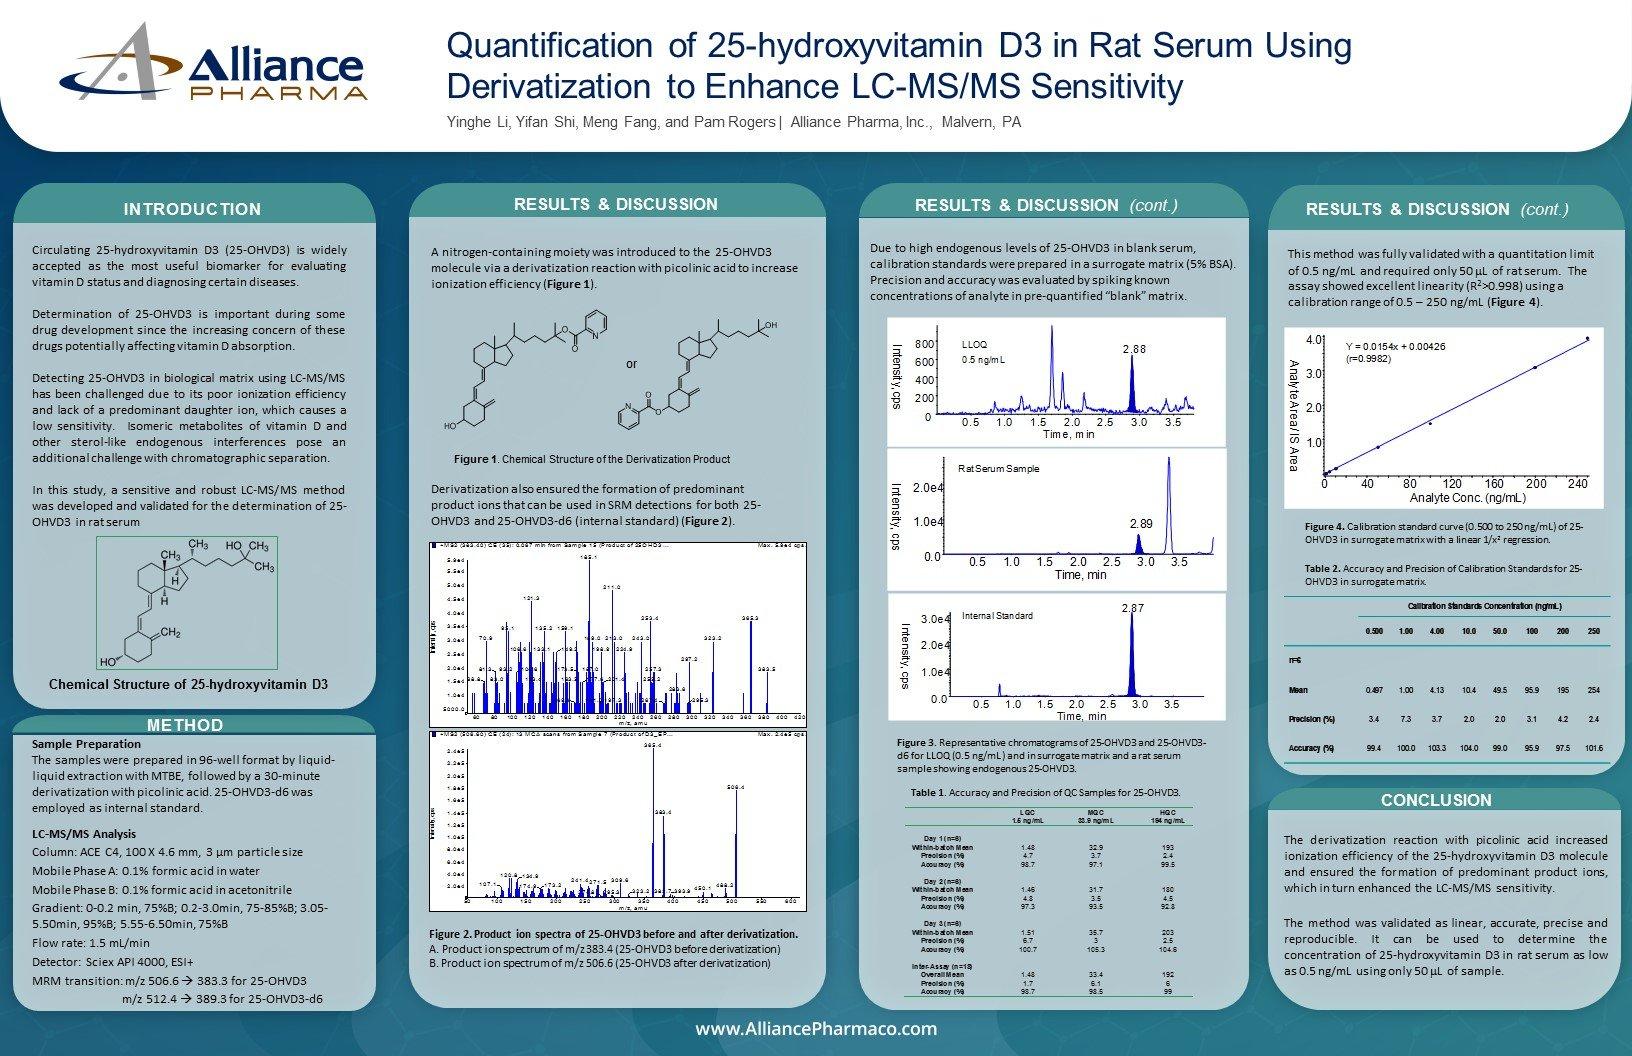 LC-MS/MS Bioanalysis Study Alliance Pharma